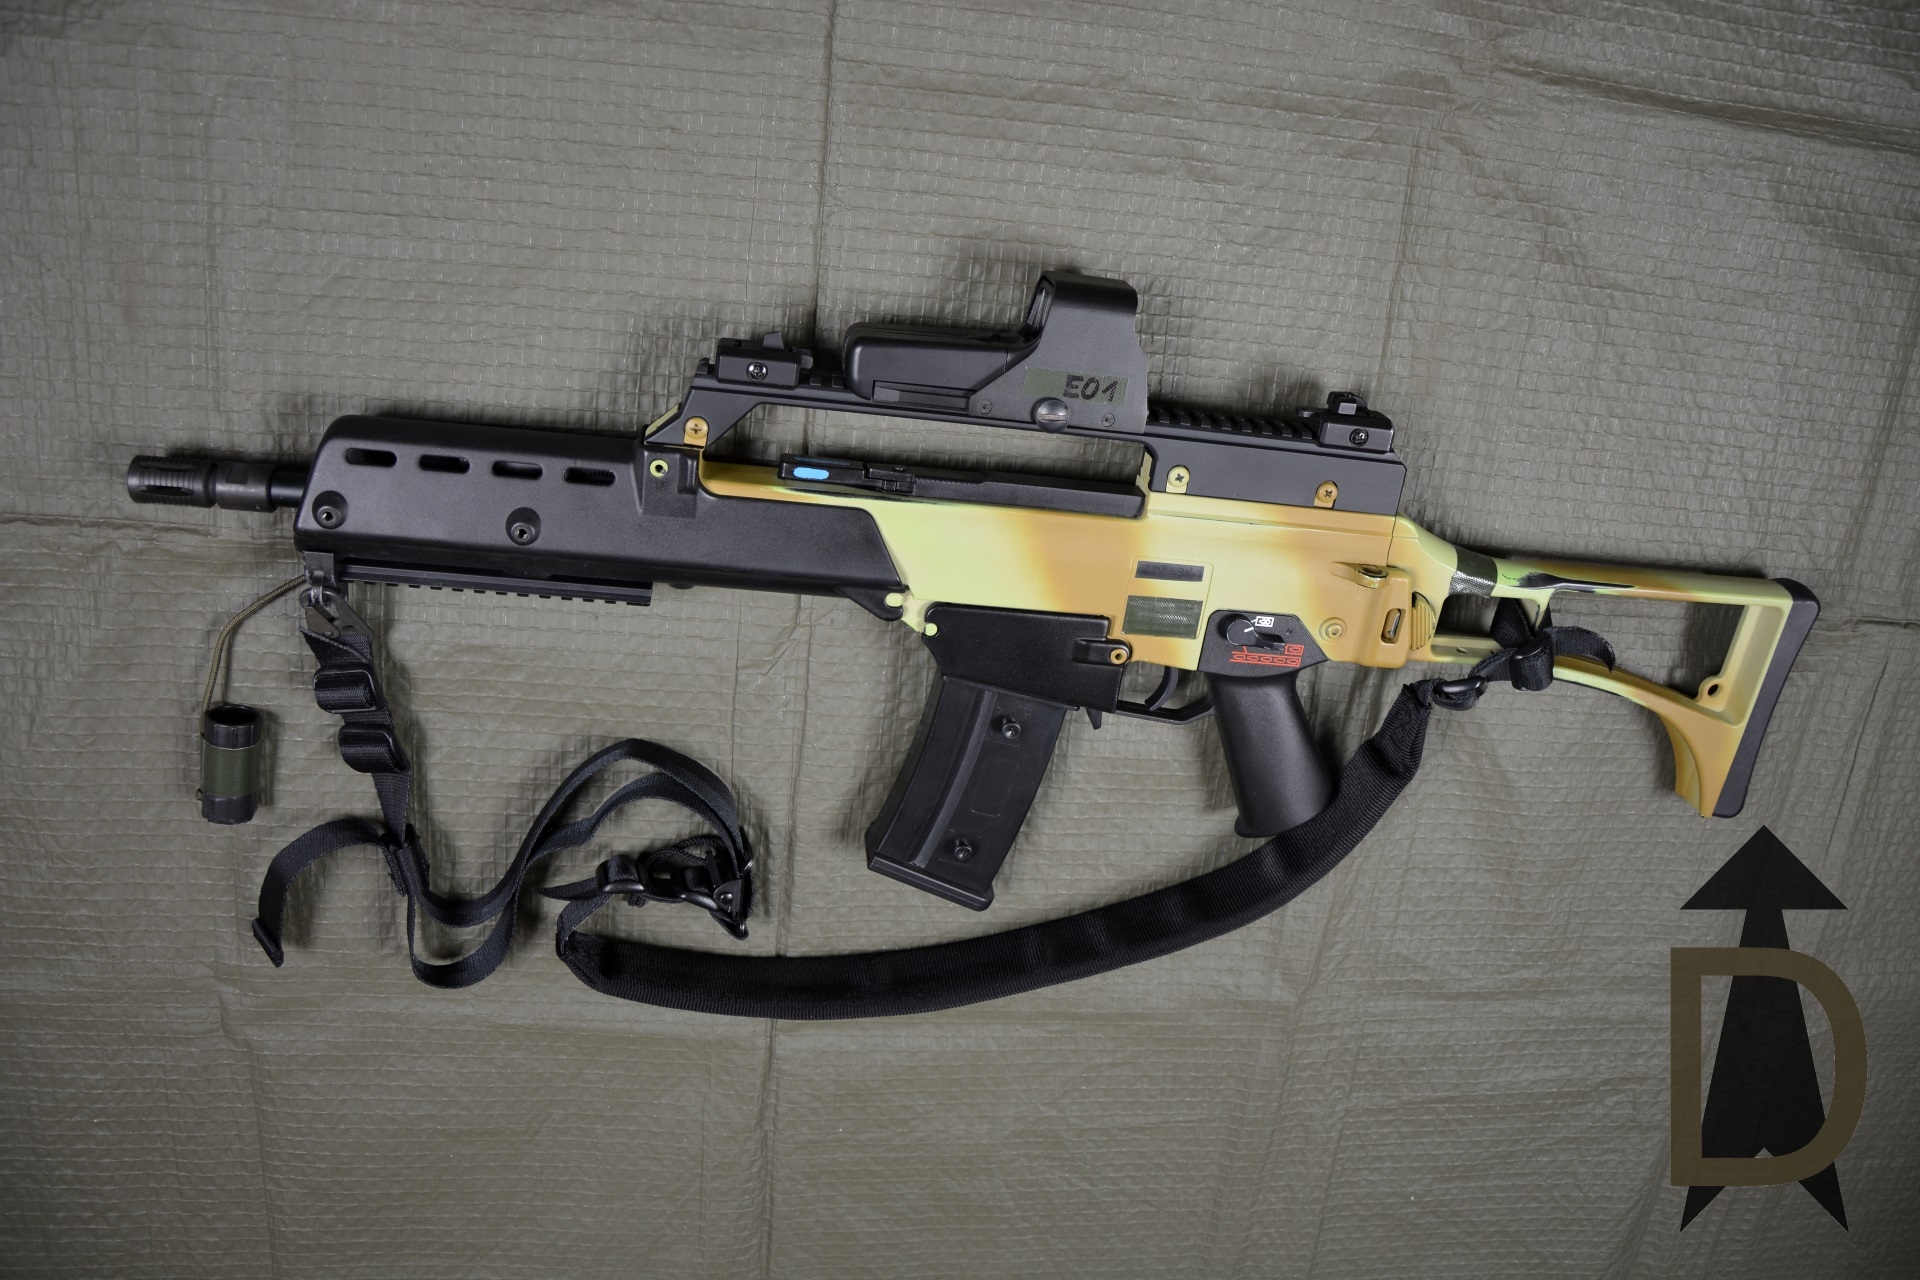 HK G36K - QD MFD, Kurzvisierschiene, MP7-Visierung, EOTech-Reflexvisier, 5.11 VTAC 2-Point-Padded-Sling